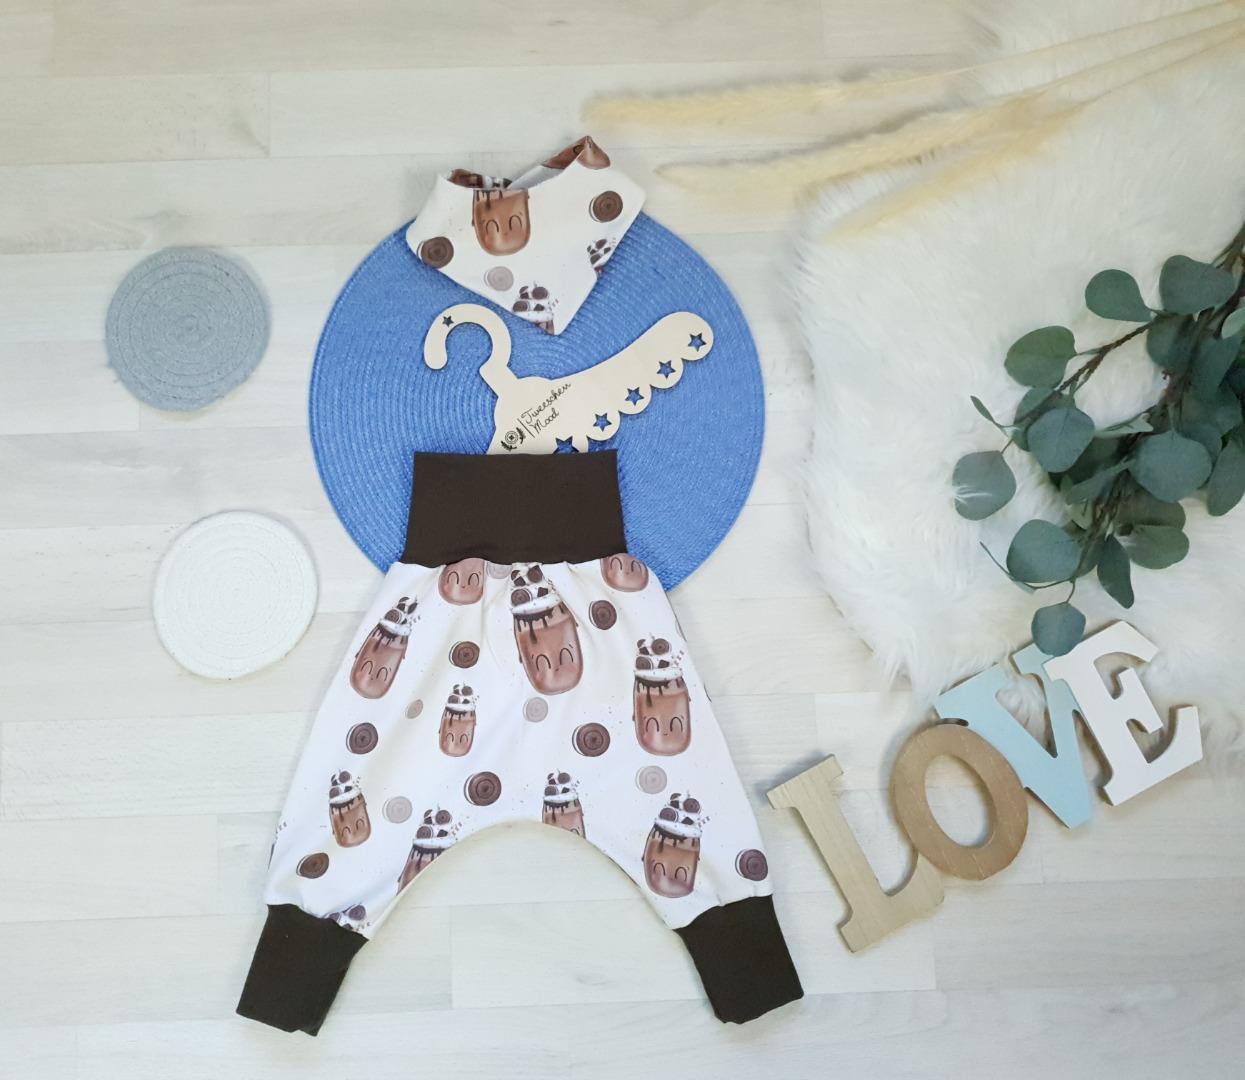 Sofortkauf Handmade Set Pumphose Halstuch Schokoshake